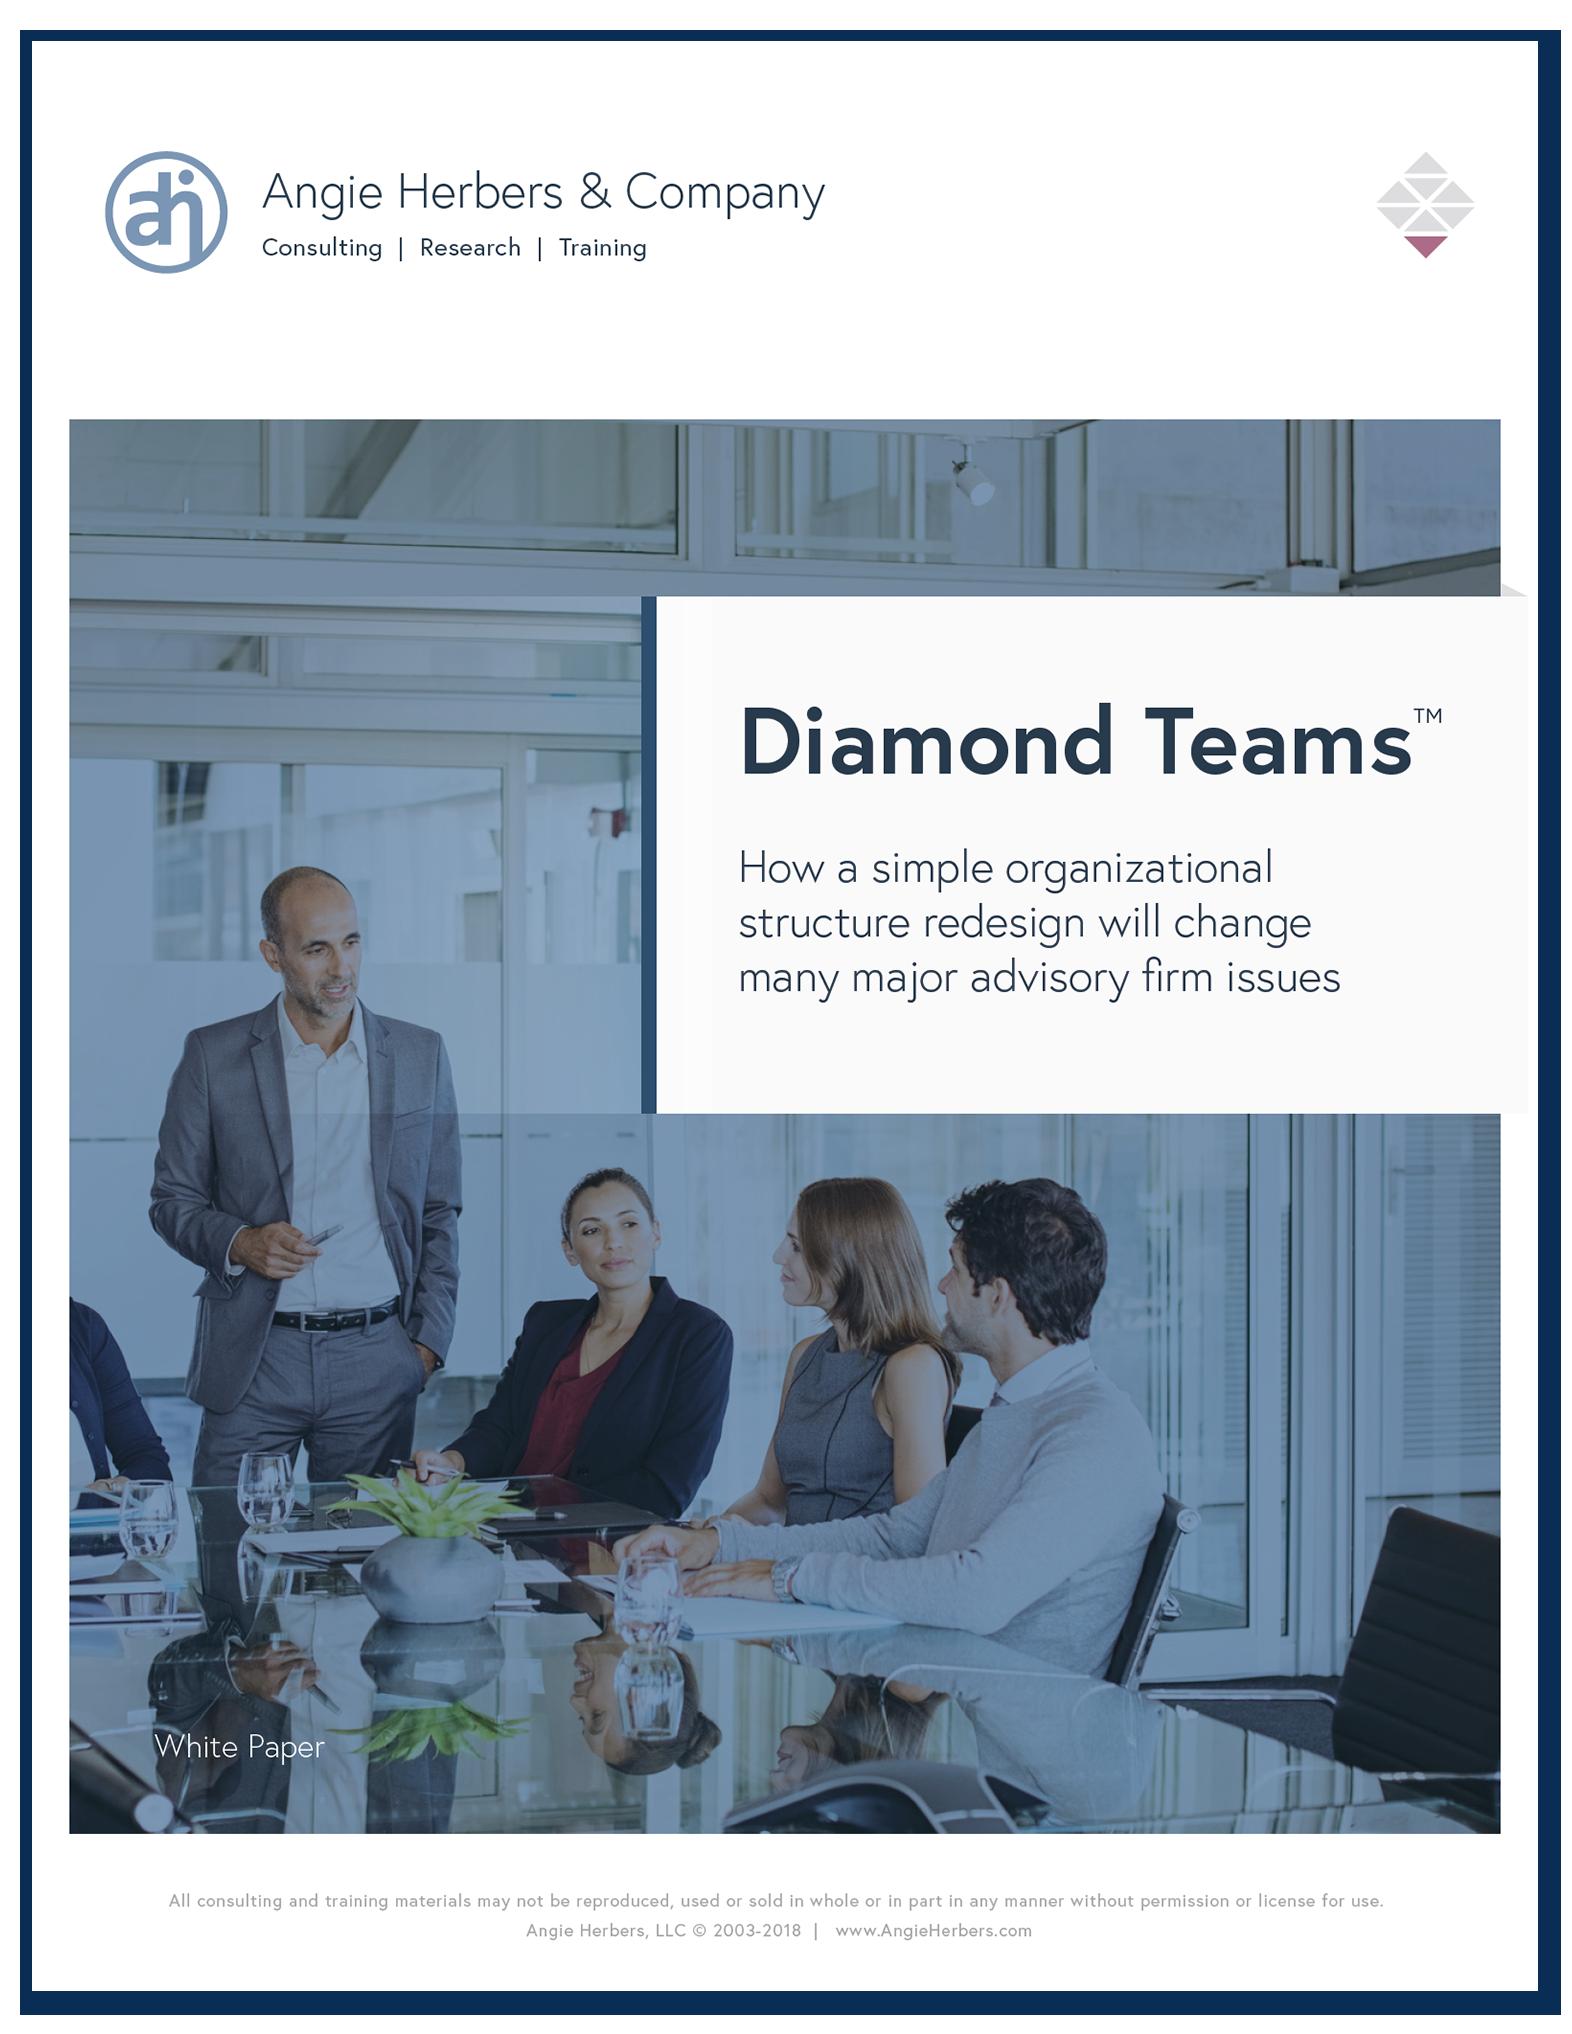 Diamond Teams™ Organizational Structure